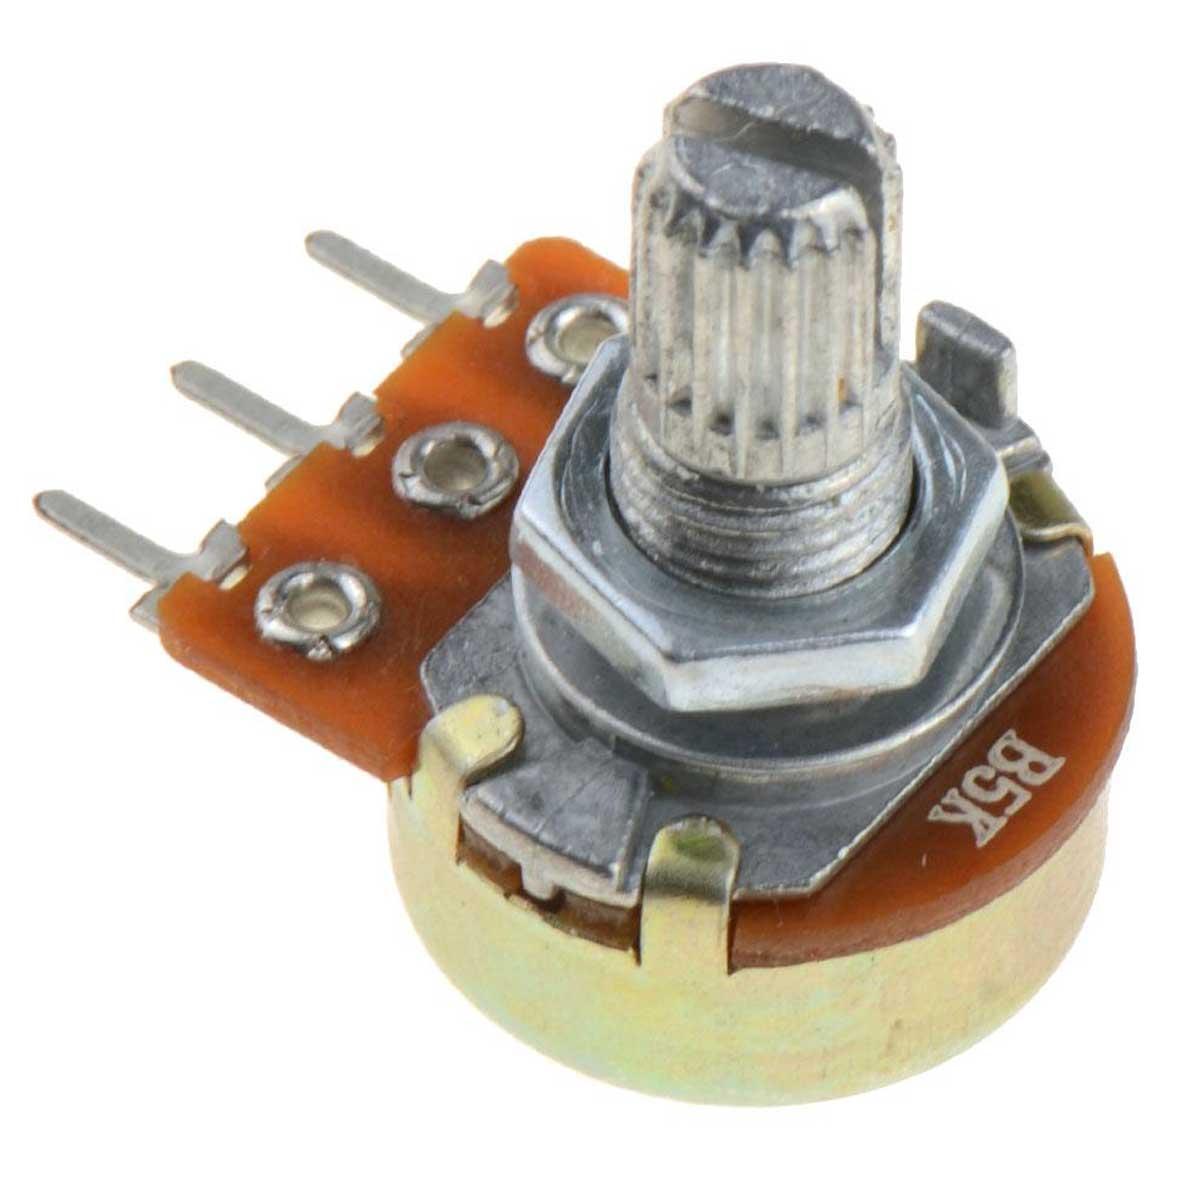 3x Potenciômetro 1K WH148-1-L20 3 Terminais